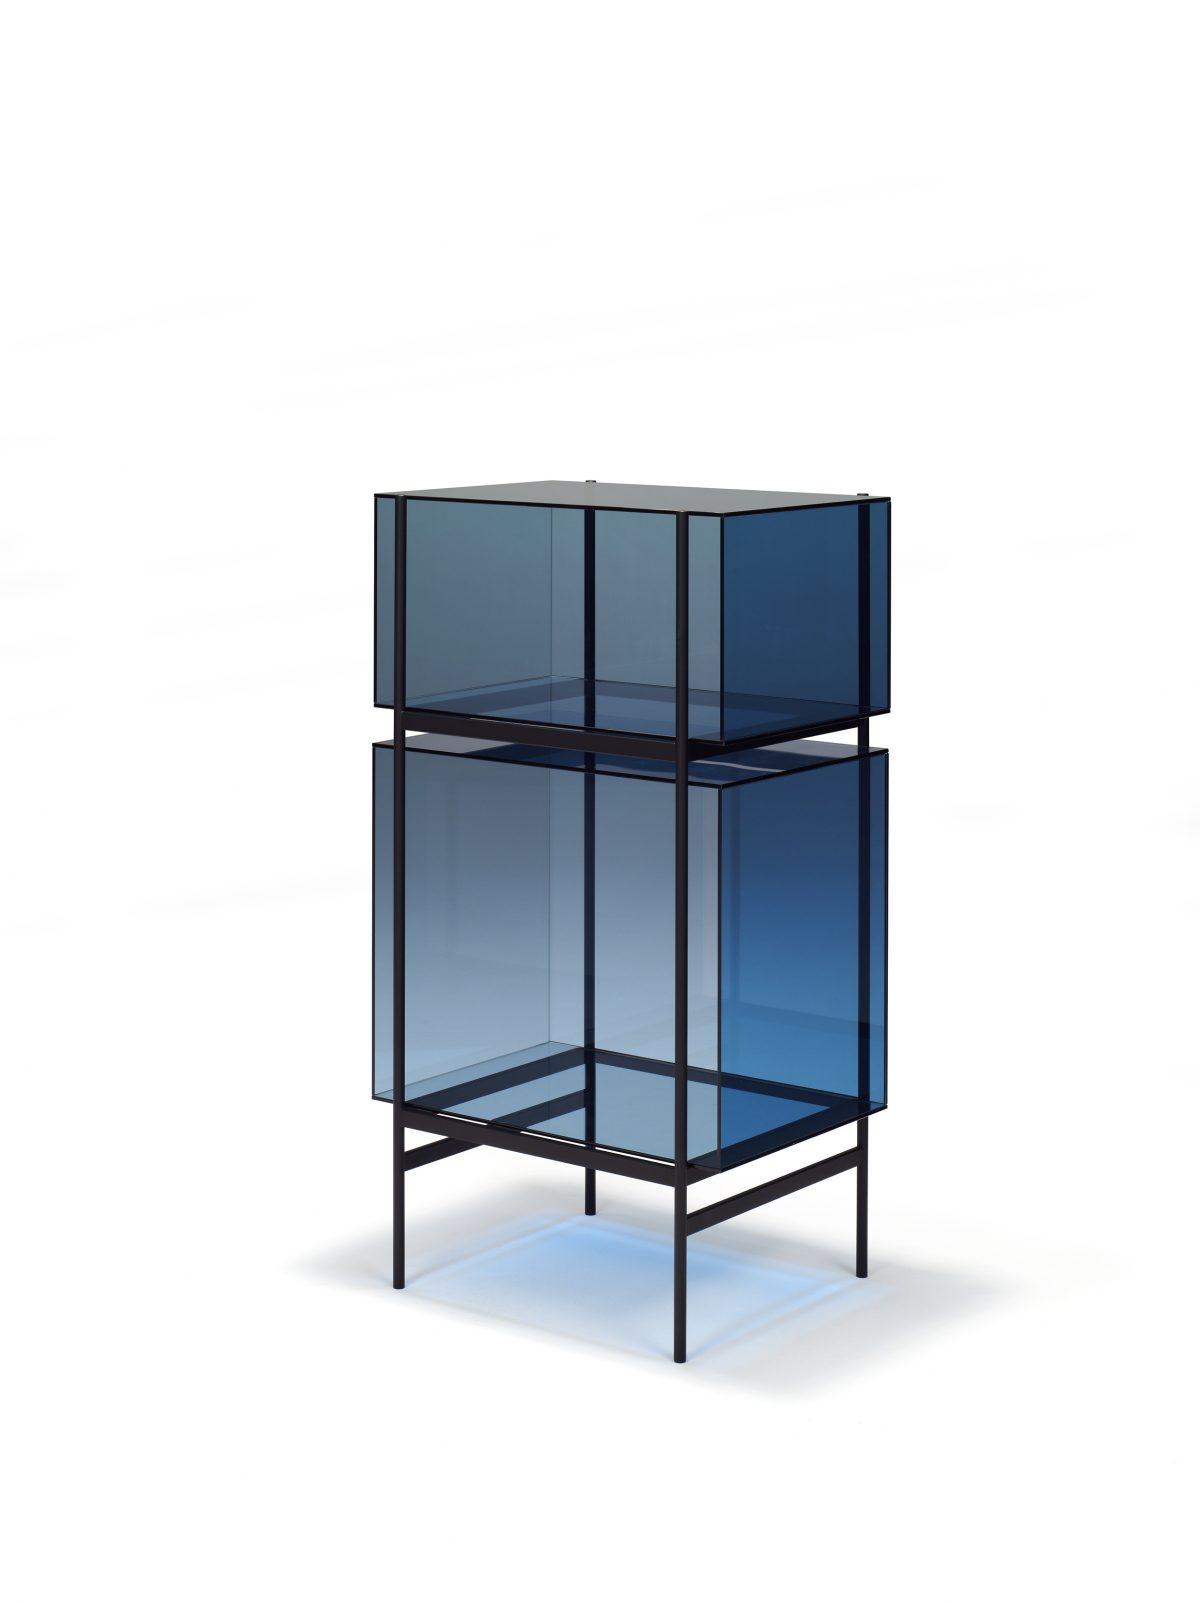 Kast LYN 2 Vakken Visser Meijwaard Exclusief Dutchdesign Zwart Frame Blauw Glas JOSHH& Helderr